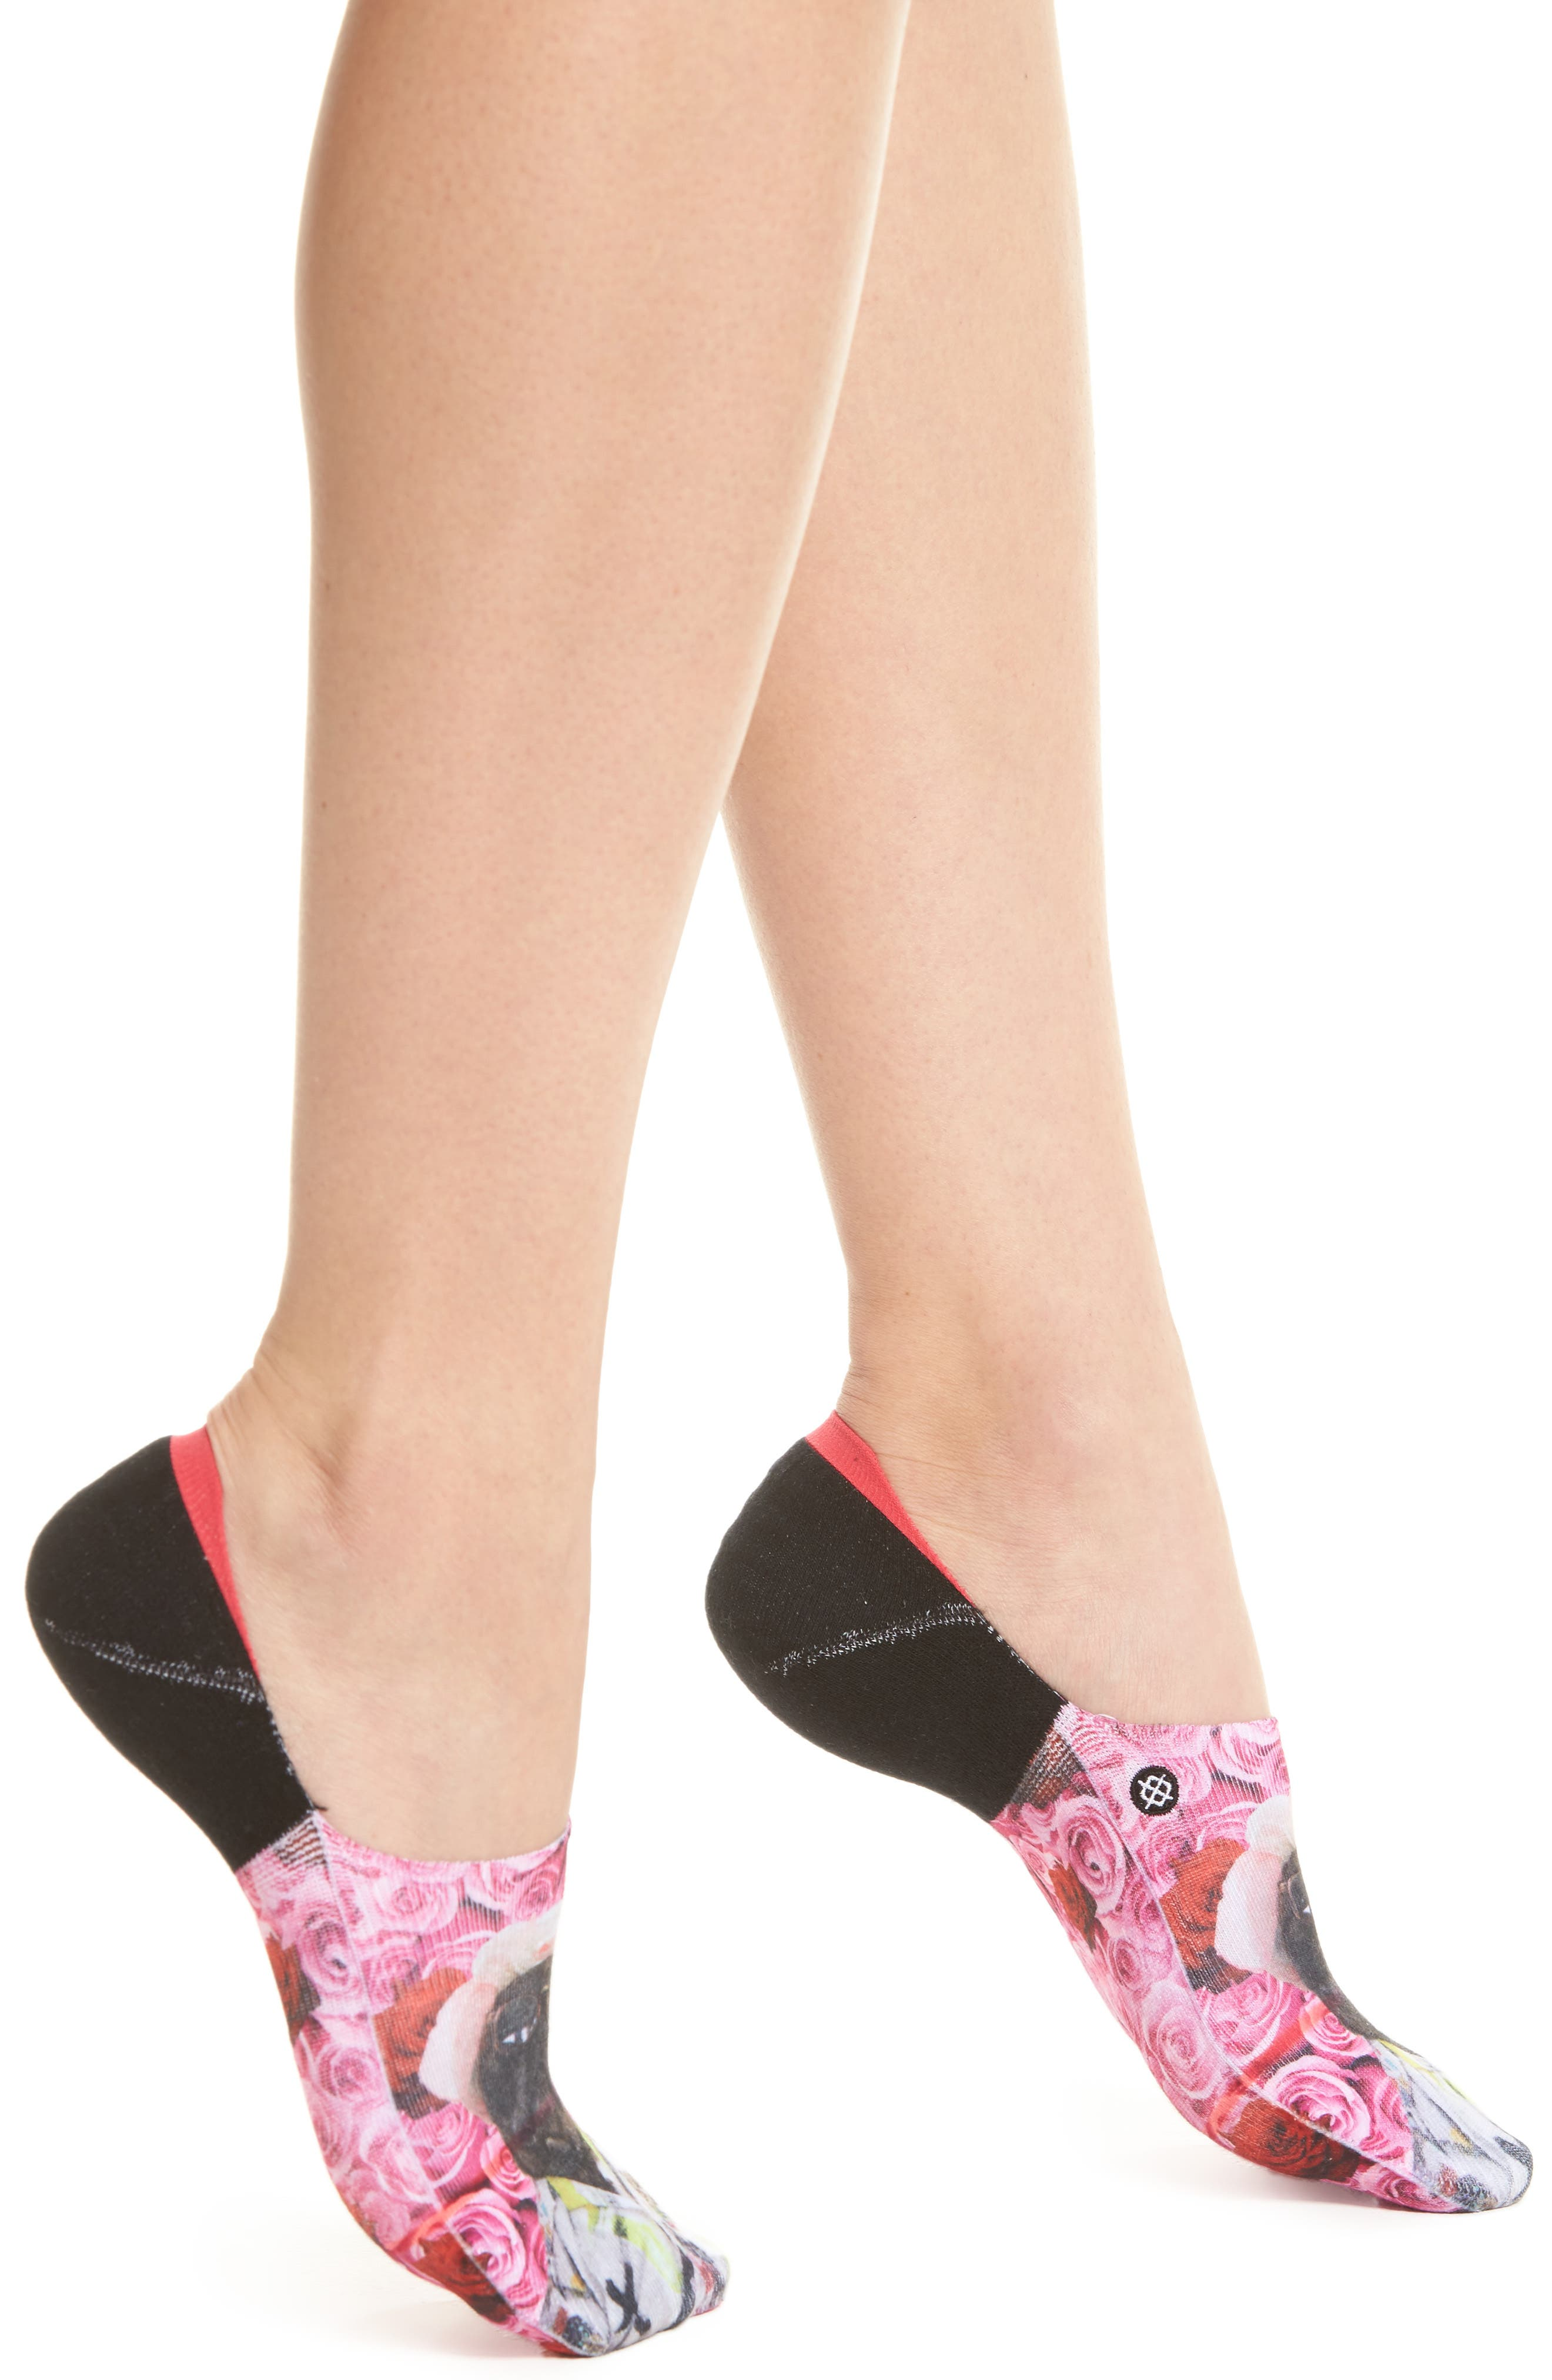 Call Me Later No-Show Socks,                         Main,                         color, 001